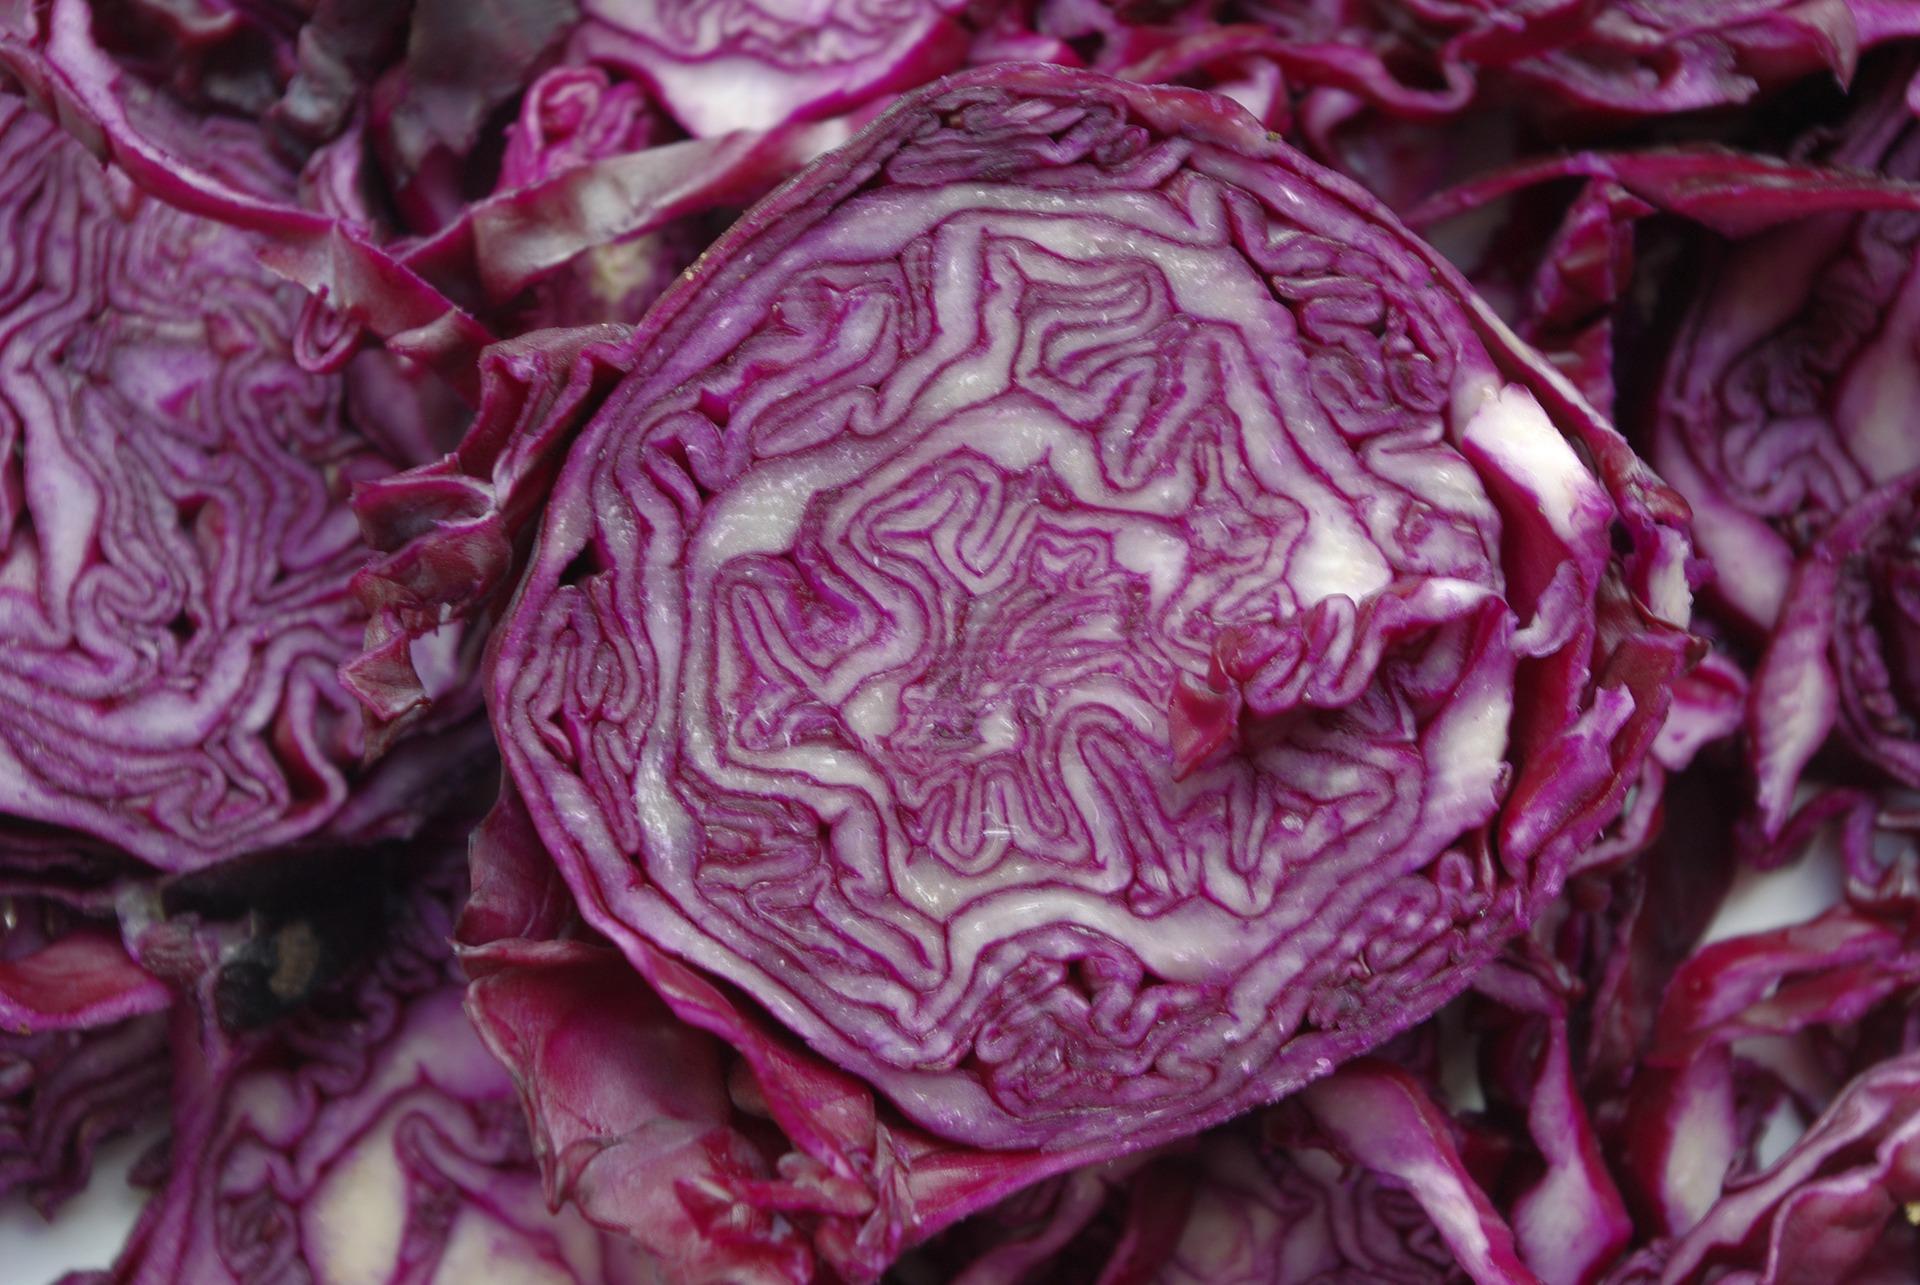 red-cabbage-1338061_1920.jpg